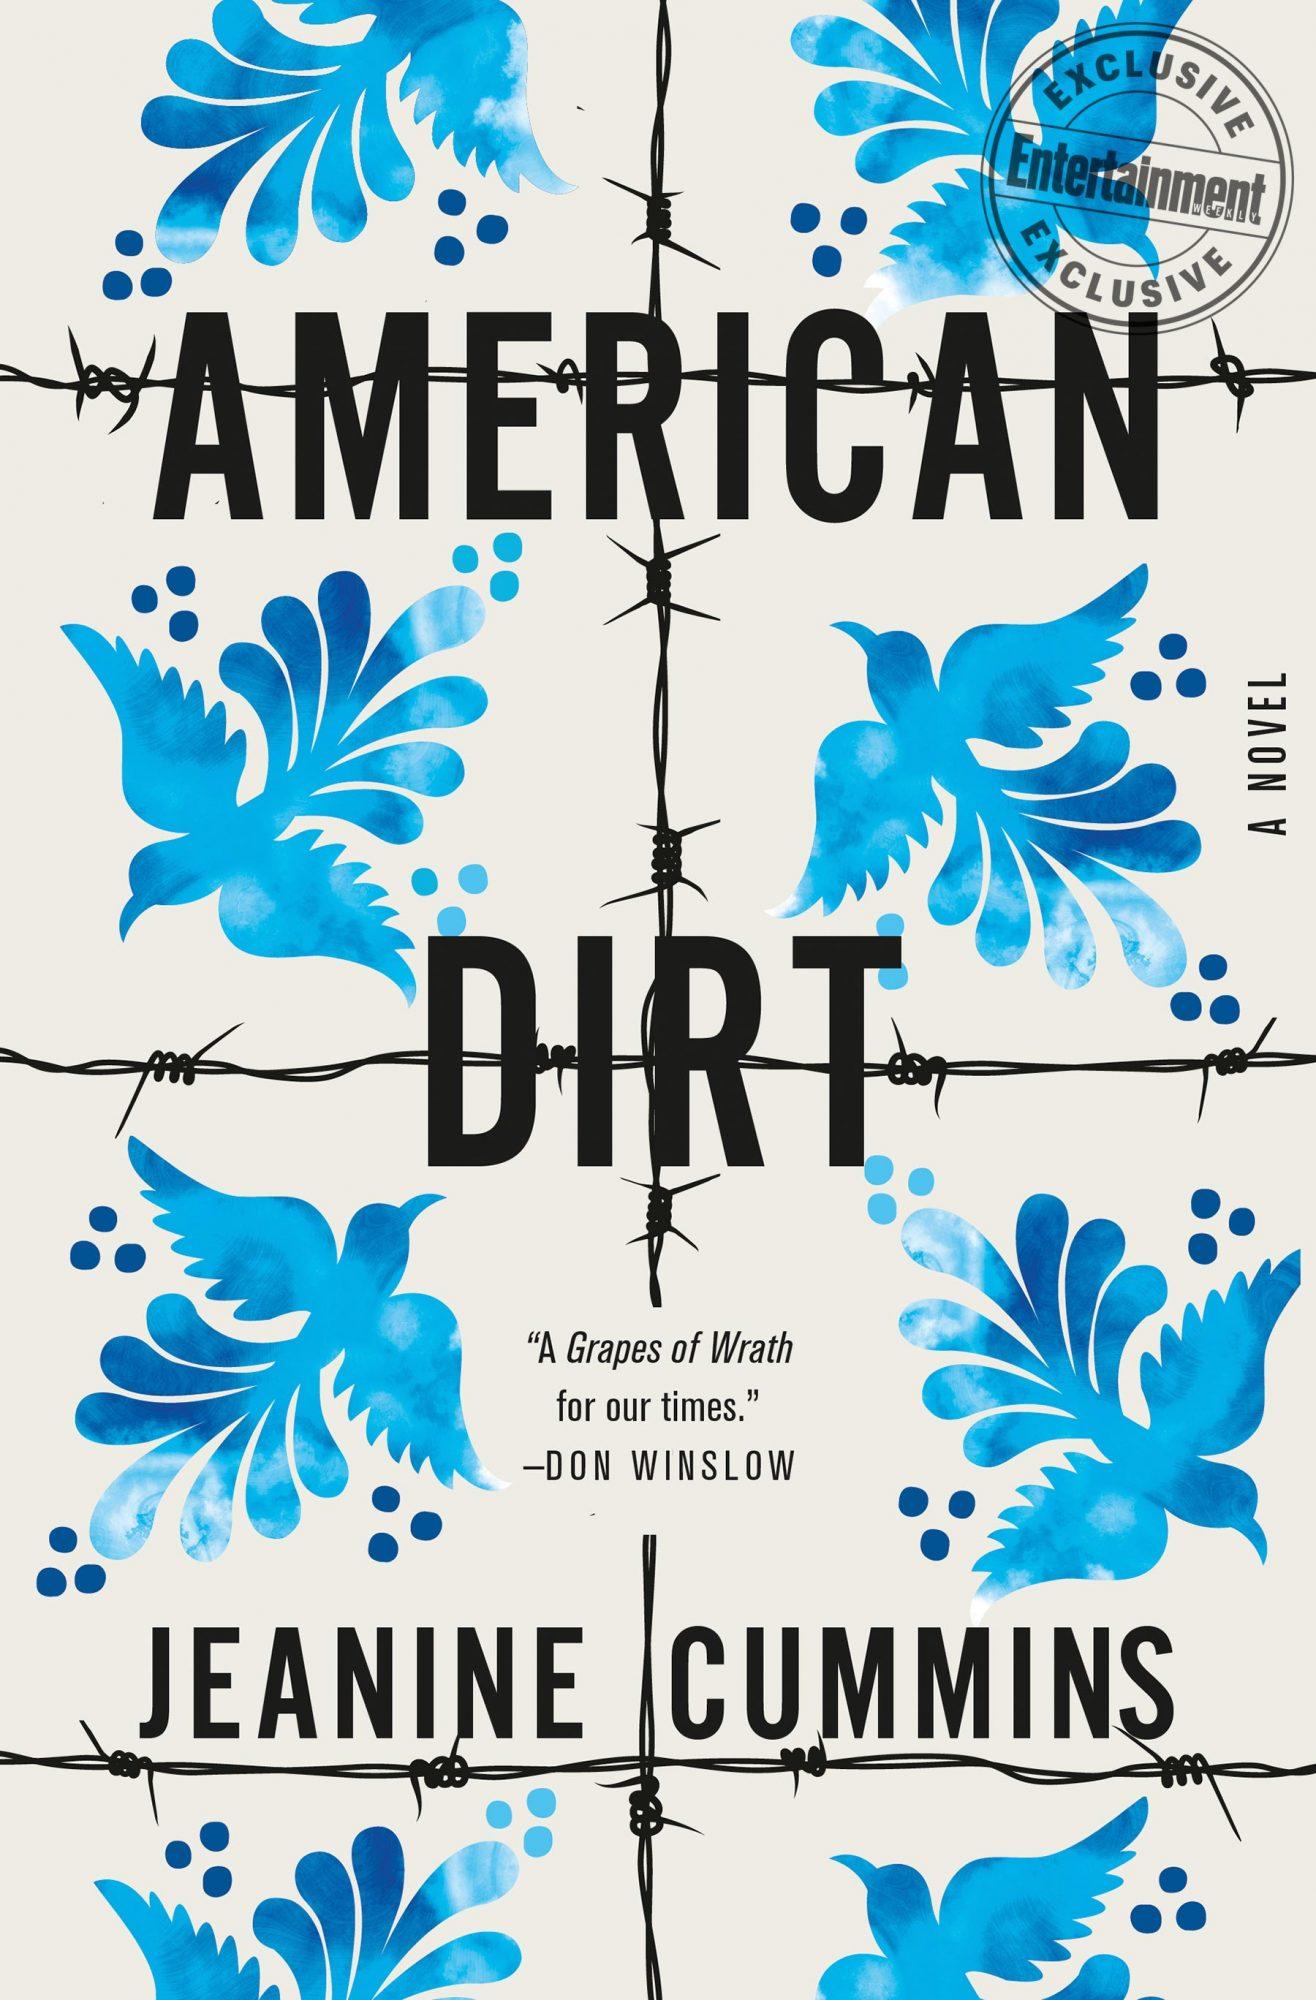 American Dirt by Jeanine Cummings CR: Flatiron Books